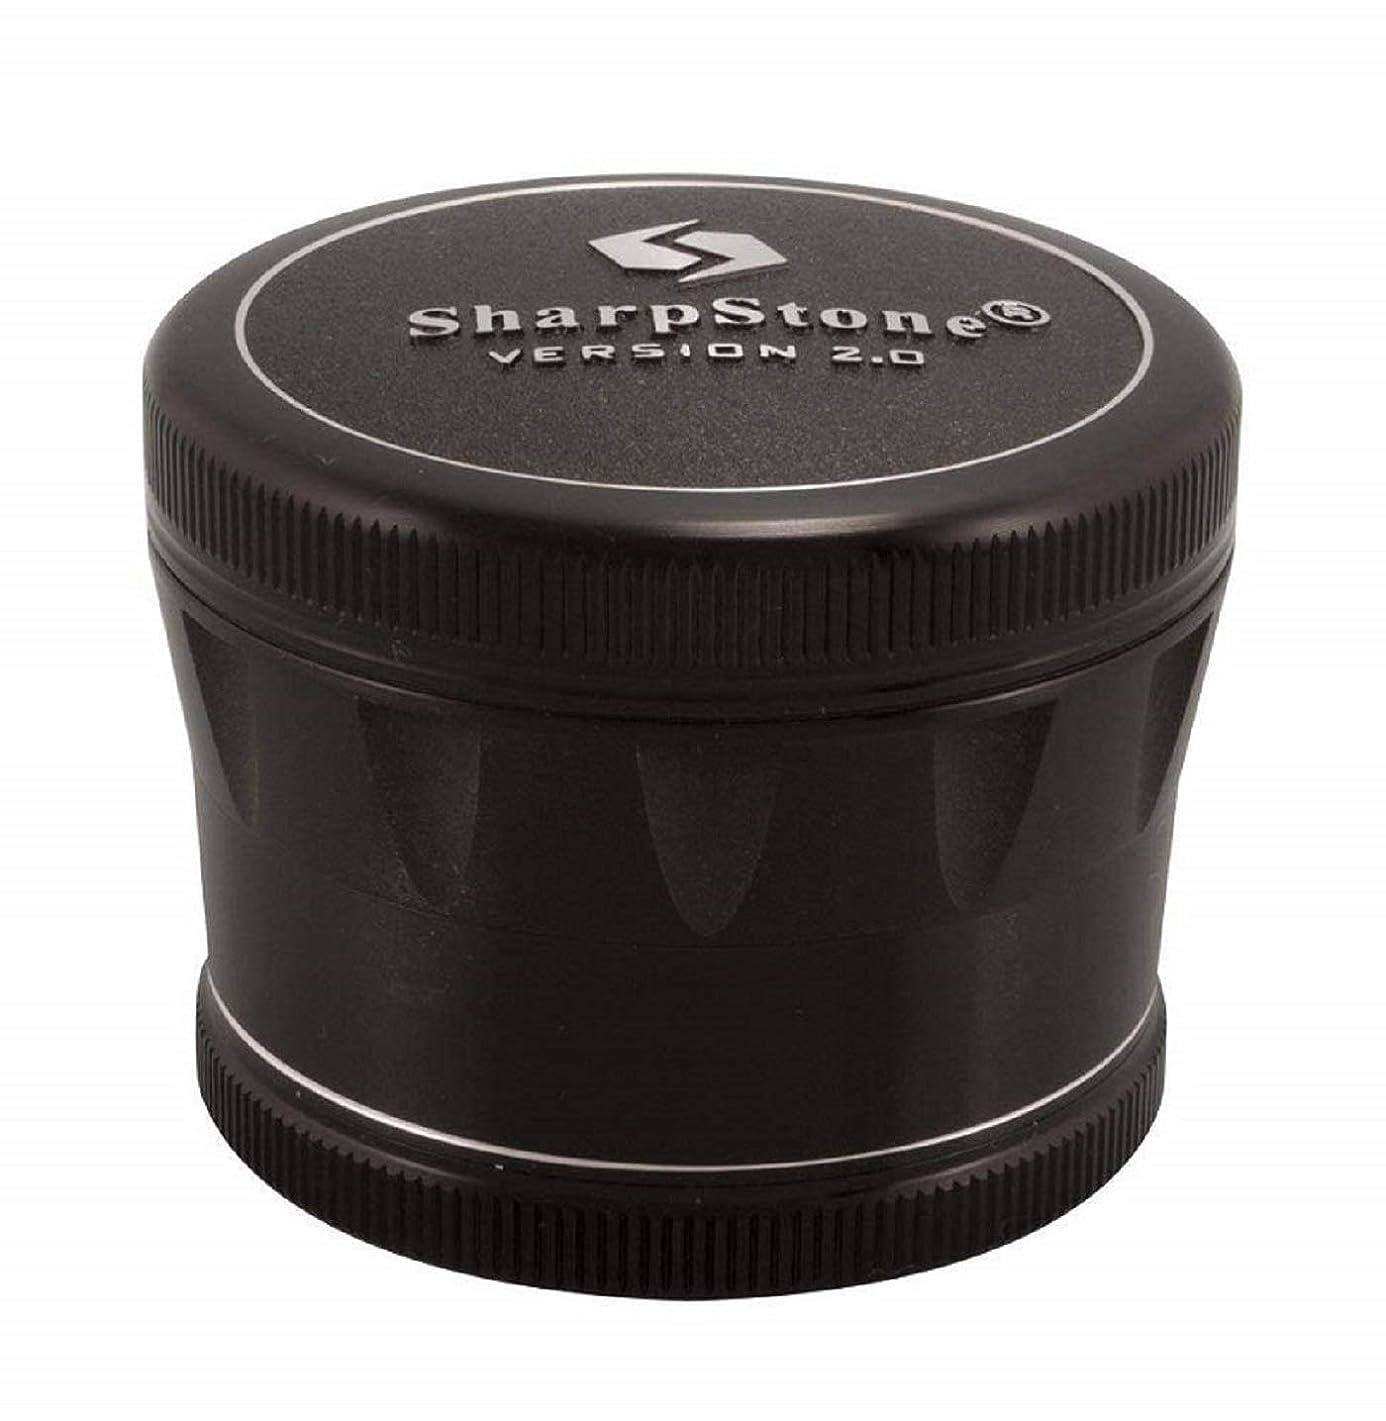 J.Shine Sharpstone 2.5